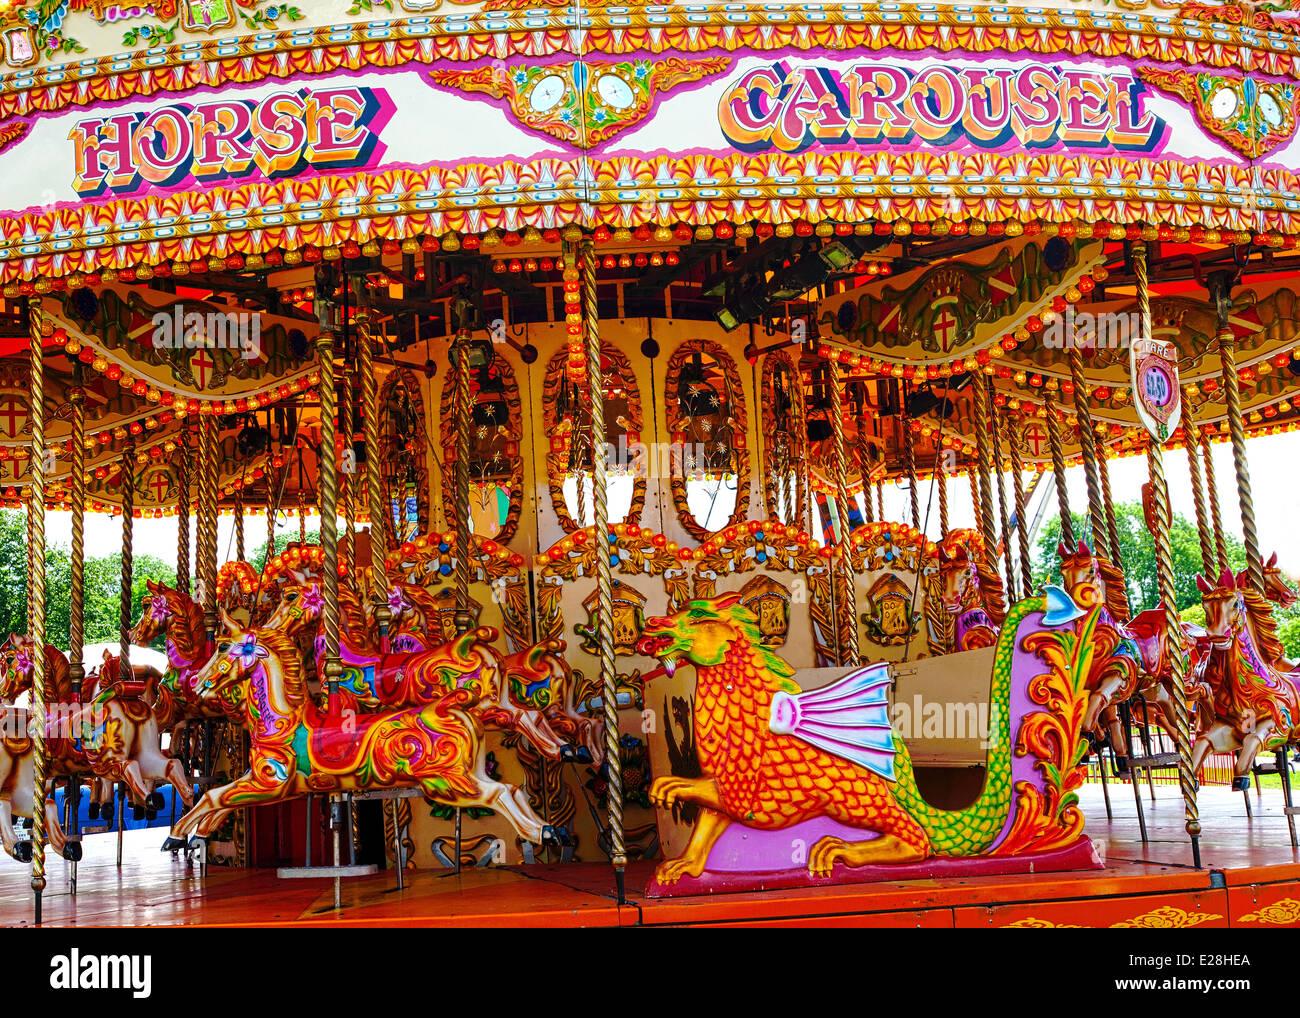 Old fashioned carousel fun fair ride Stock Photo: 70260130 - Alamy